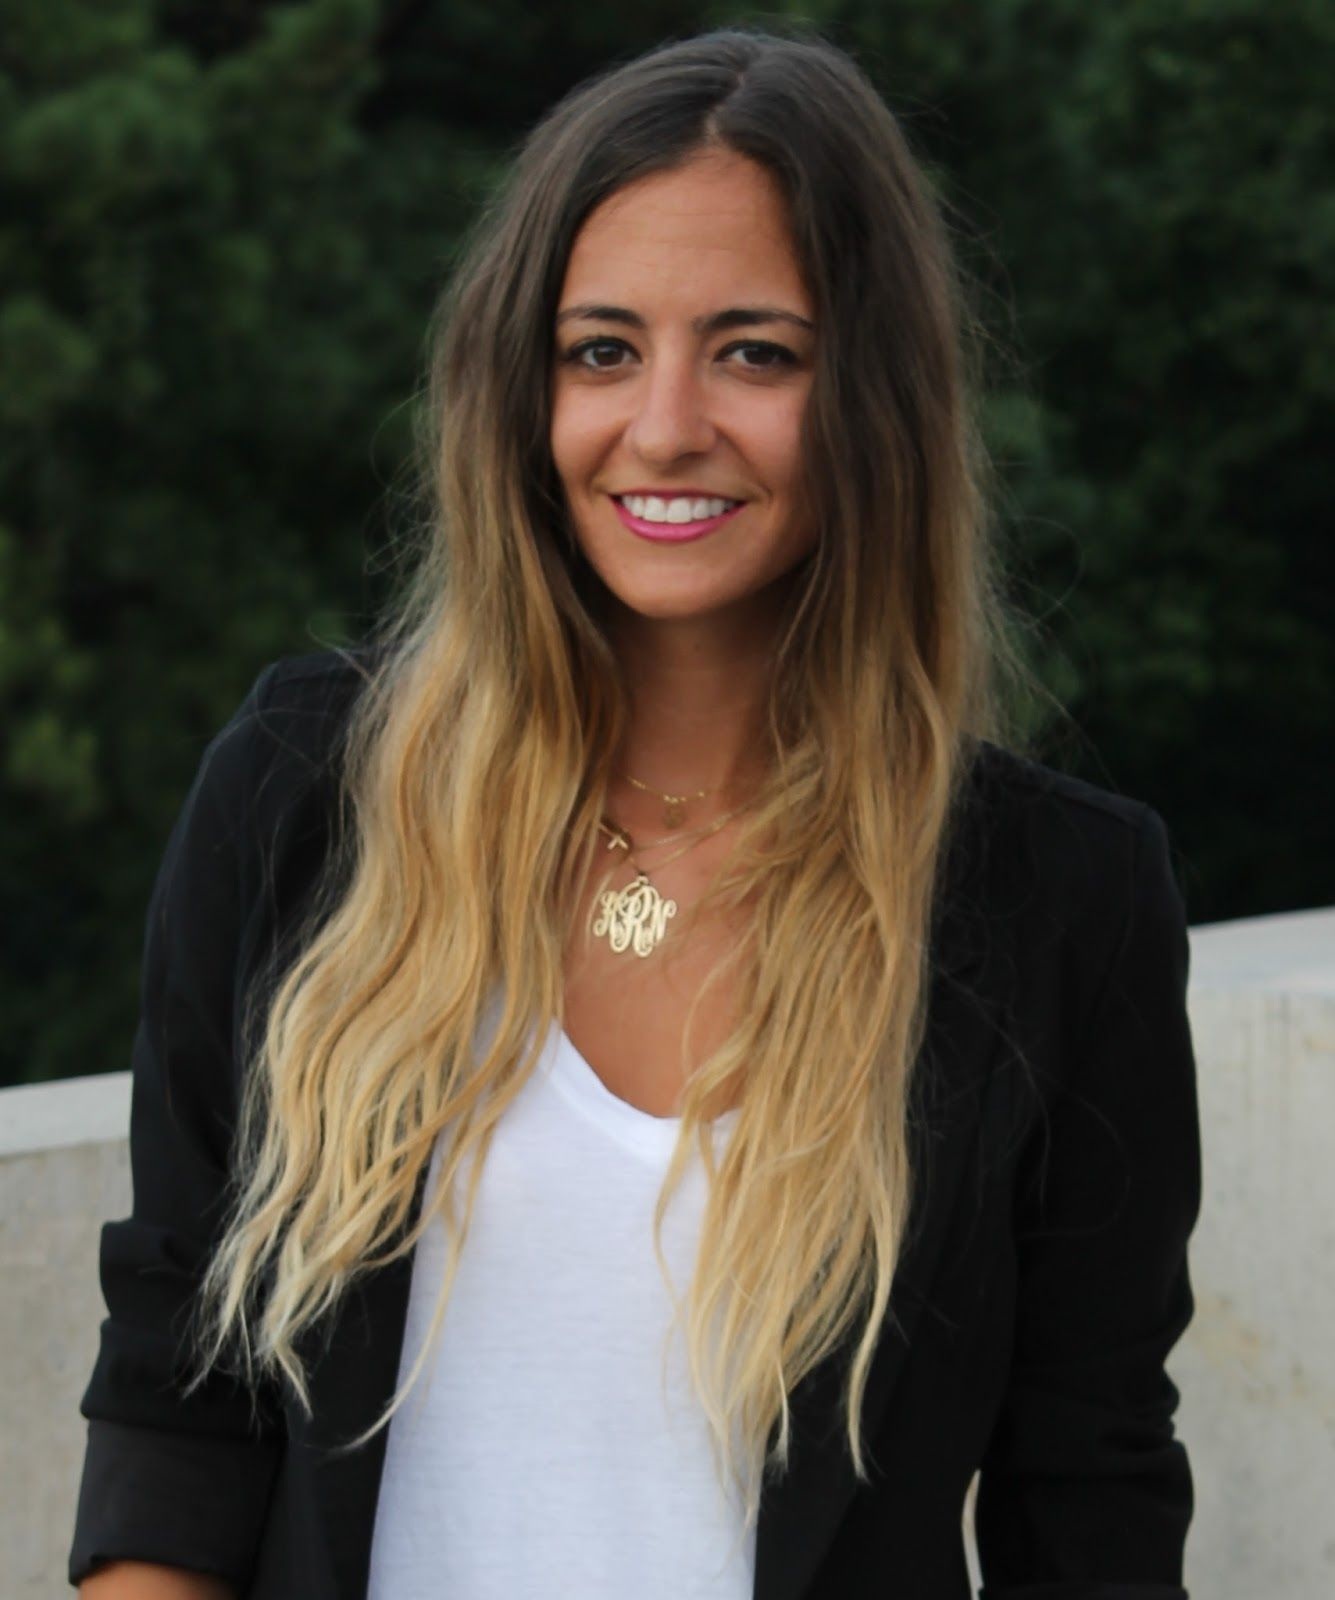 Follow Jessica Alba ombre hair trend